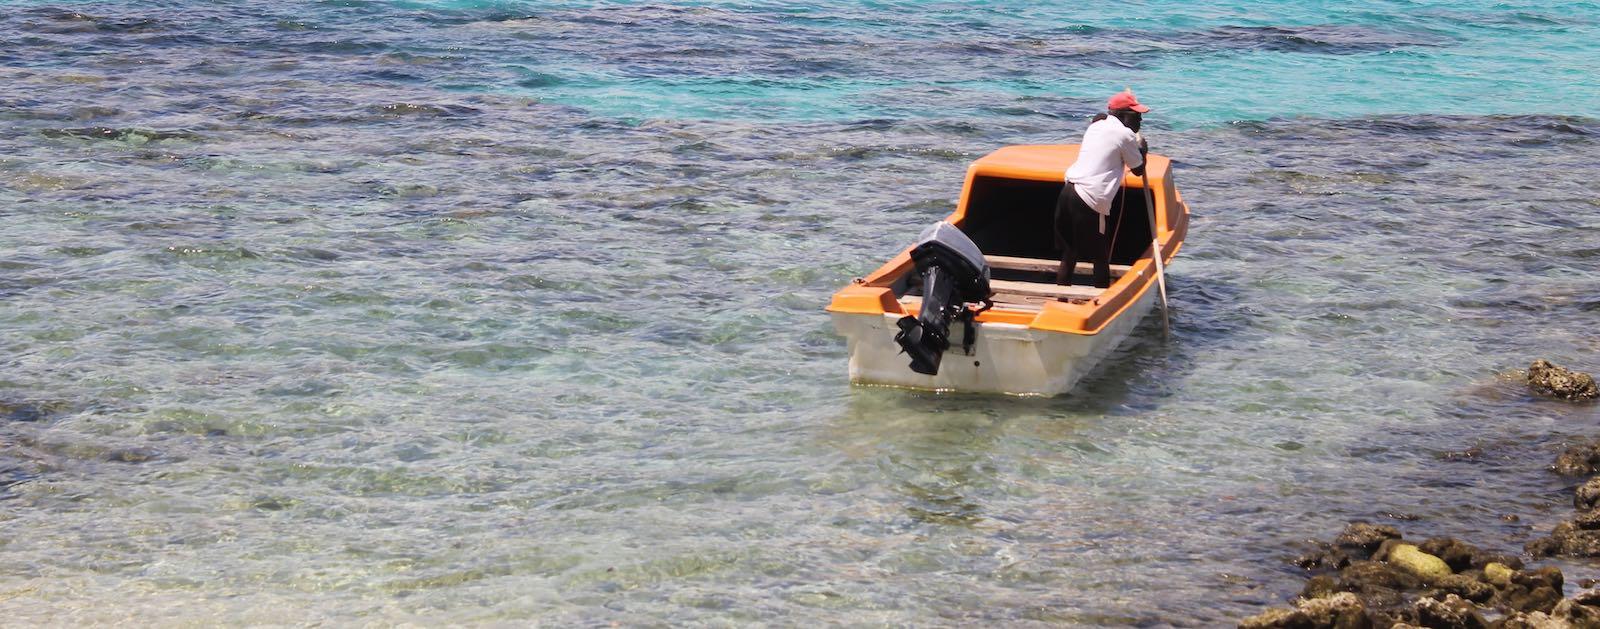 Lelepa Island, Vanuatu (Photo: UN Women Asia-Pacific/Flickr)